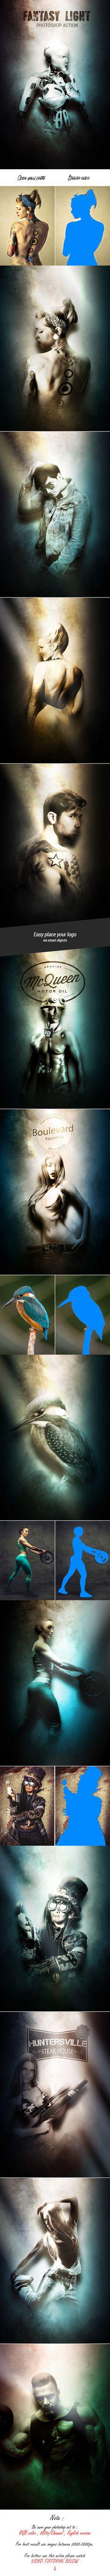 Fantasy Light - Photoshop Action. Download here: https://graphicriver.net/item/fantasy-light-photoshop-action/17681887?ref=ksioks